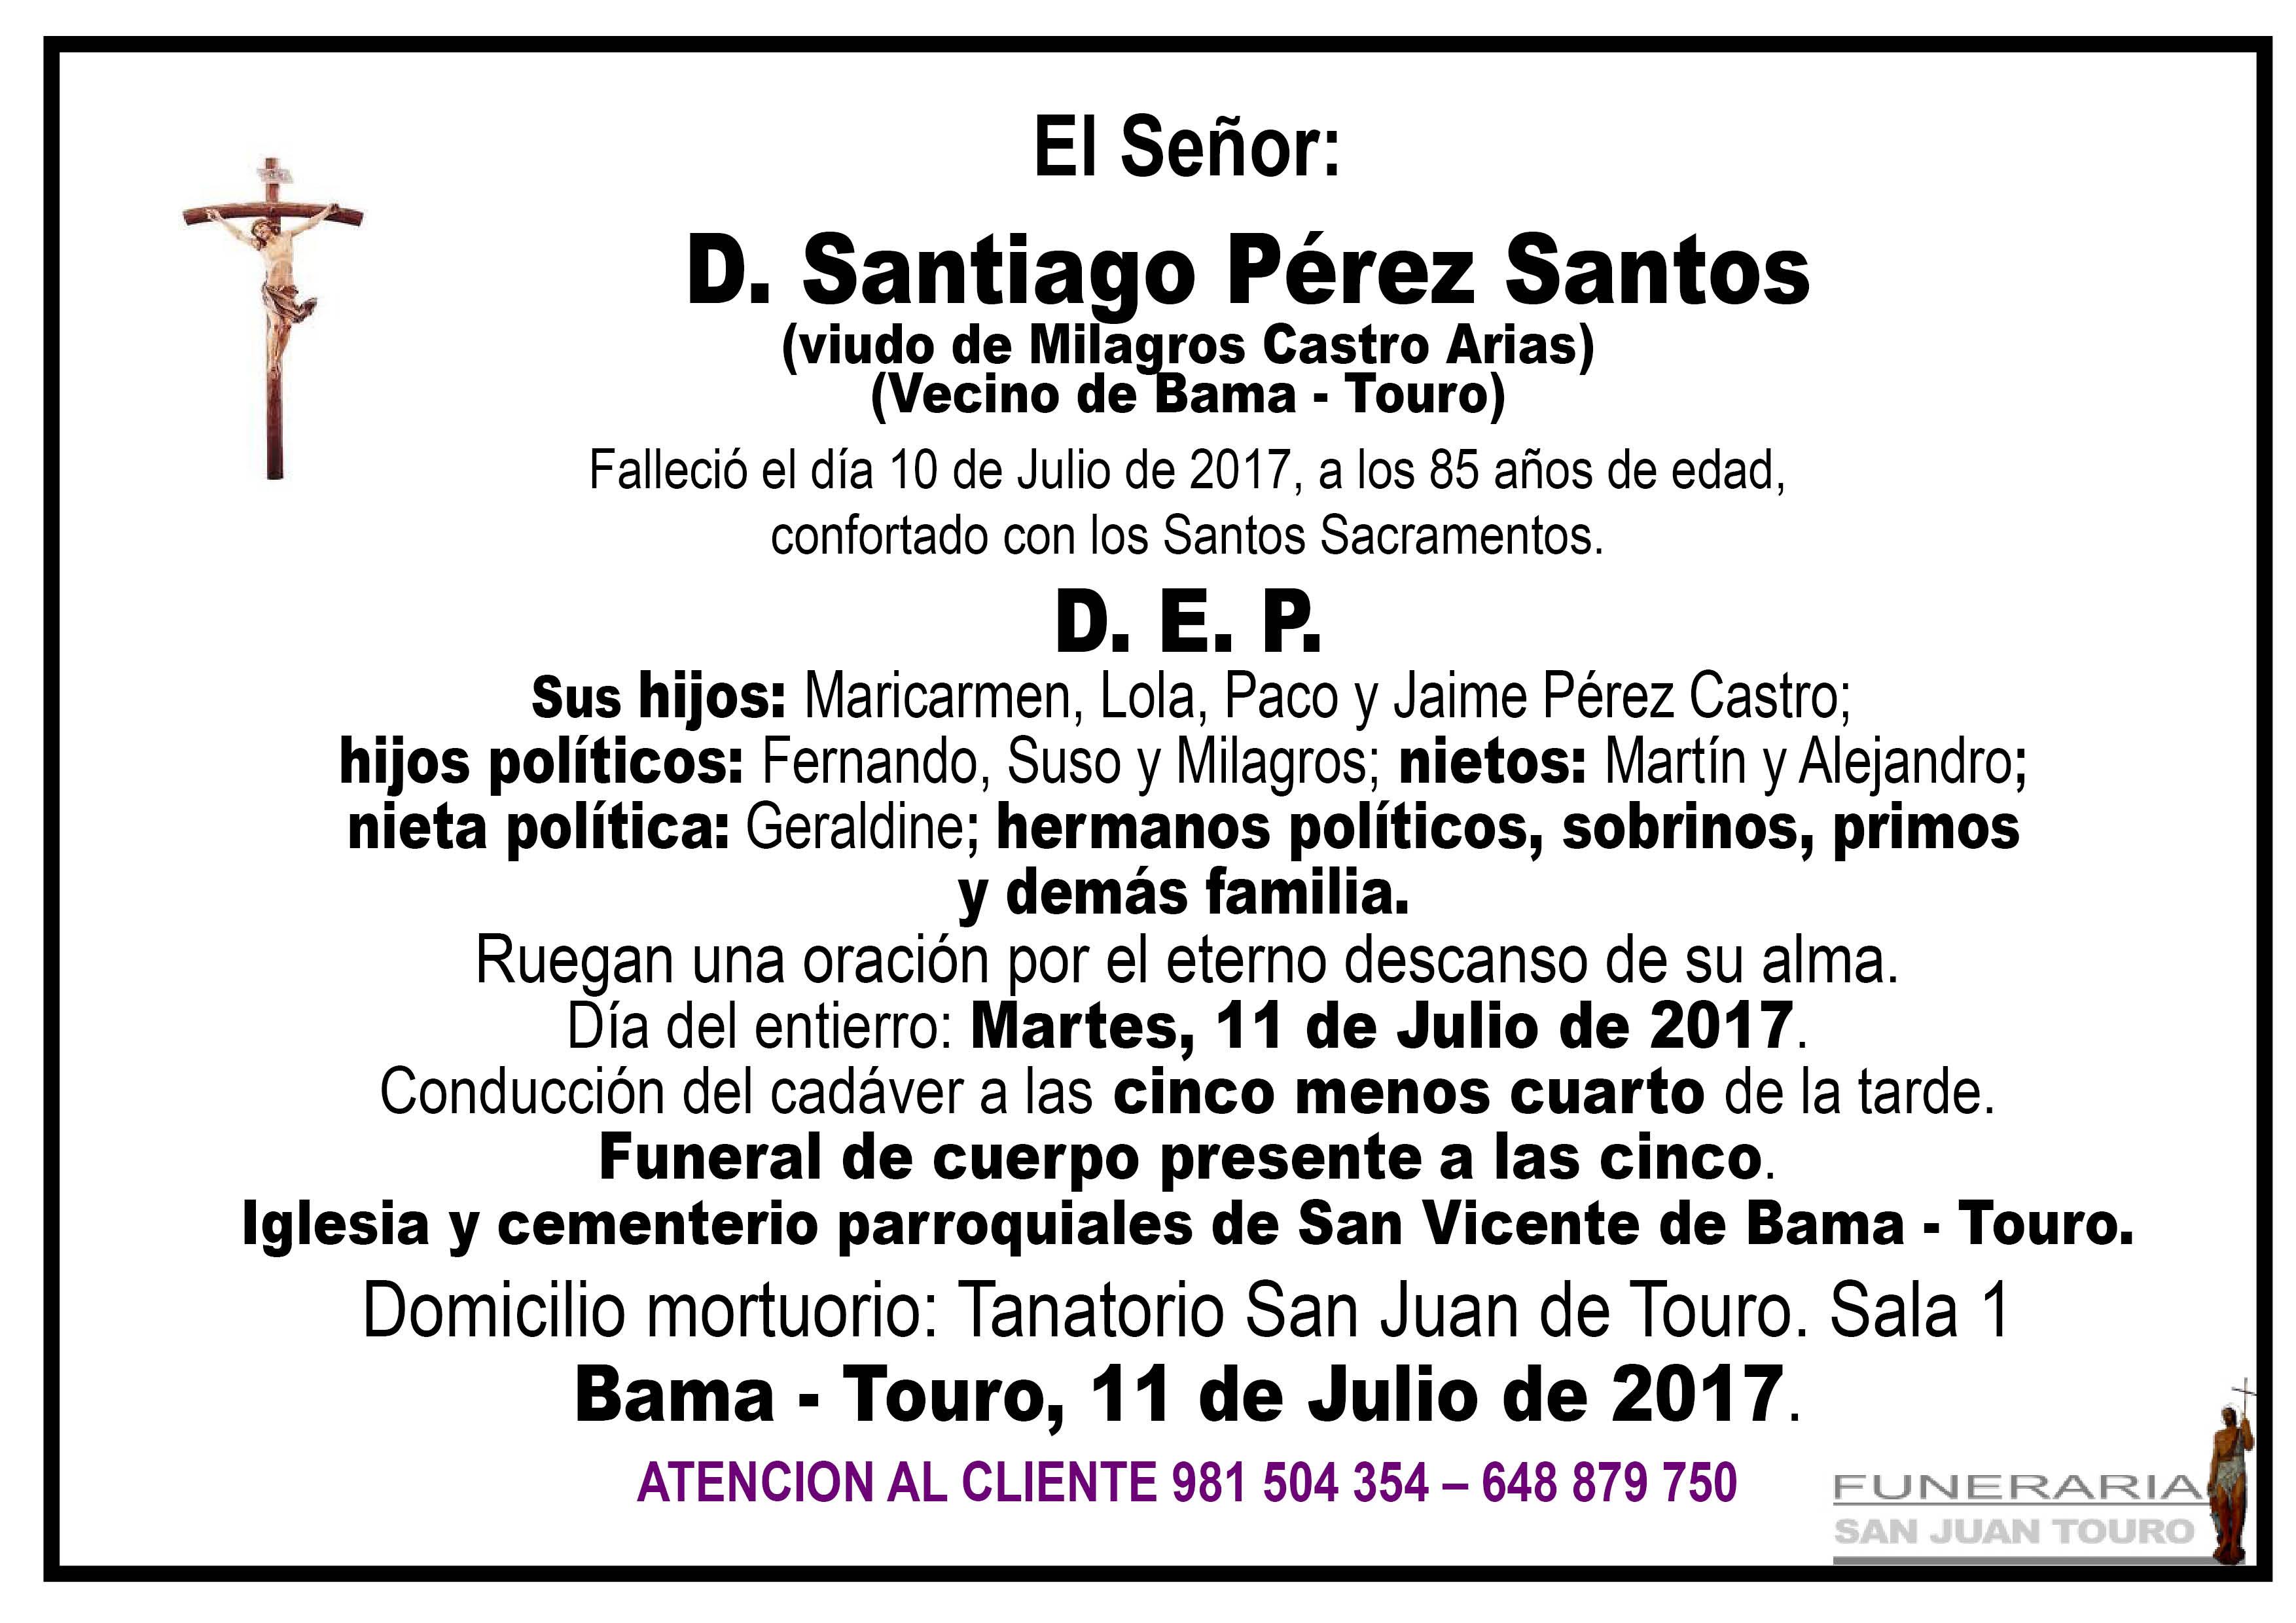 Esquela de SEPELIO DE D. SANTIAGO PEREZ SANTOS